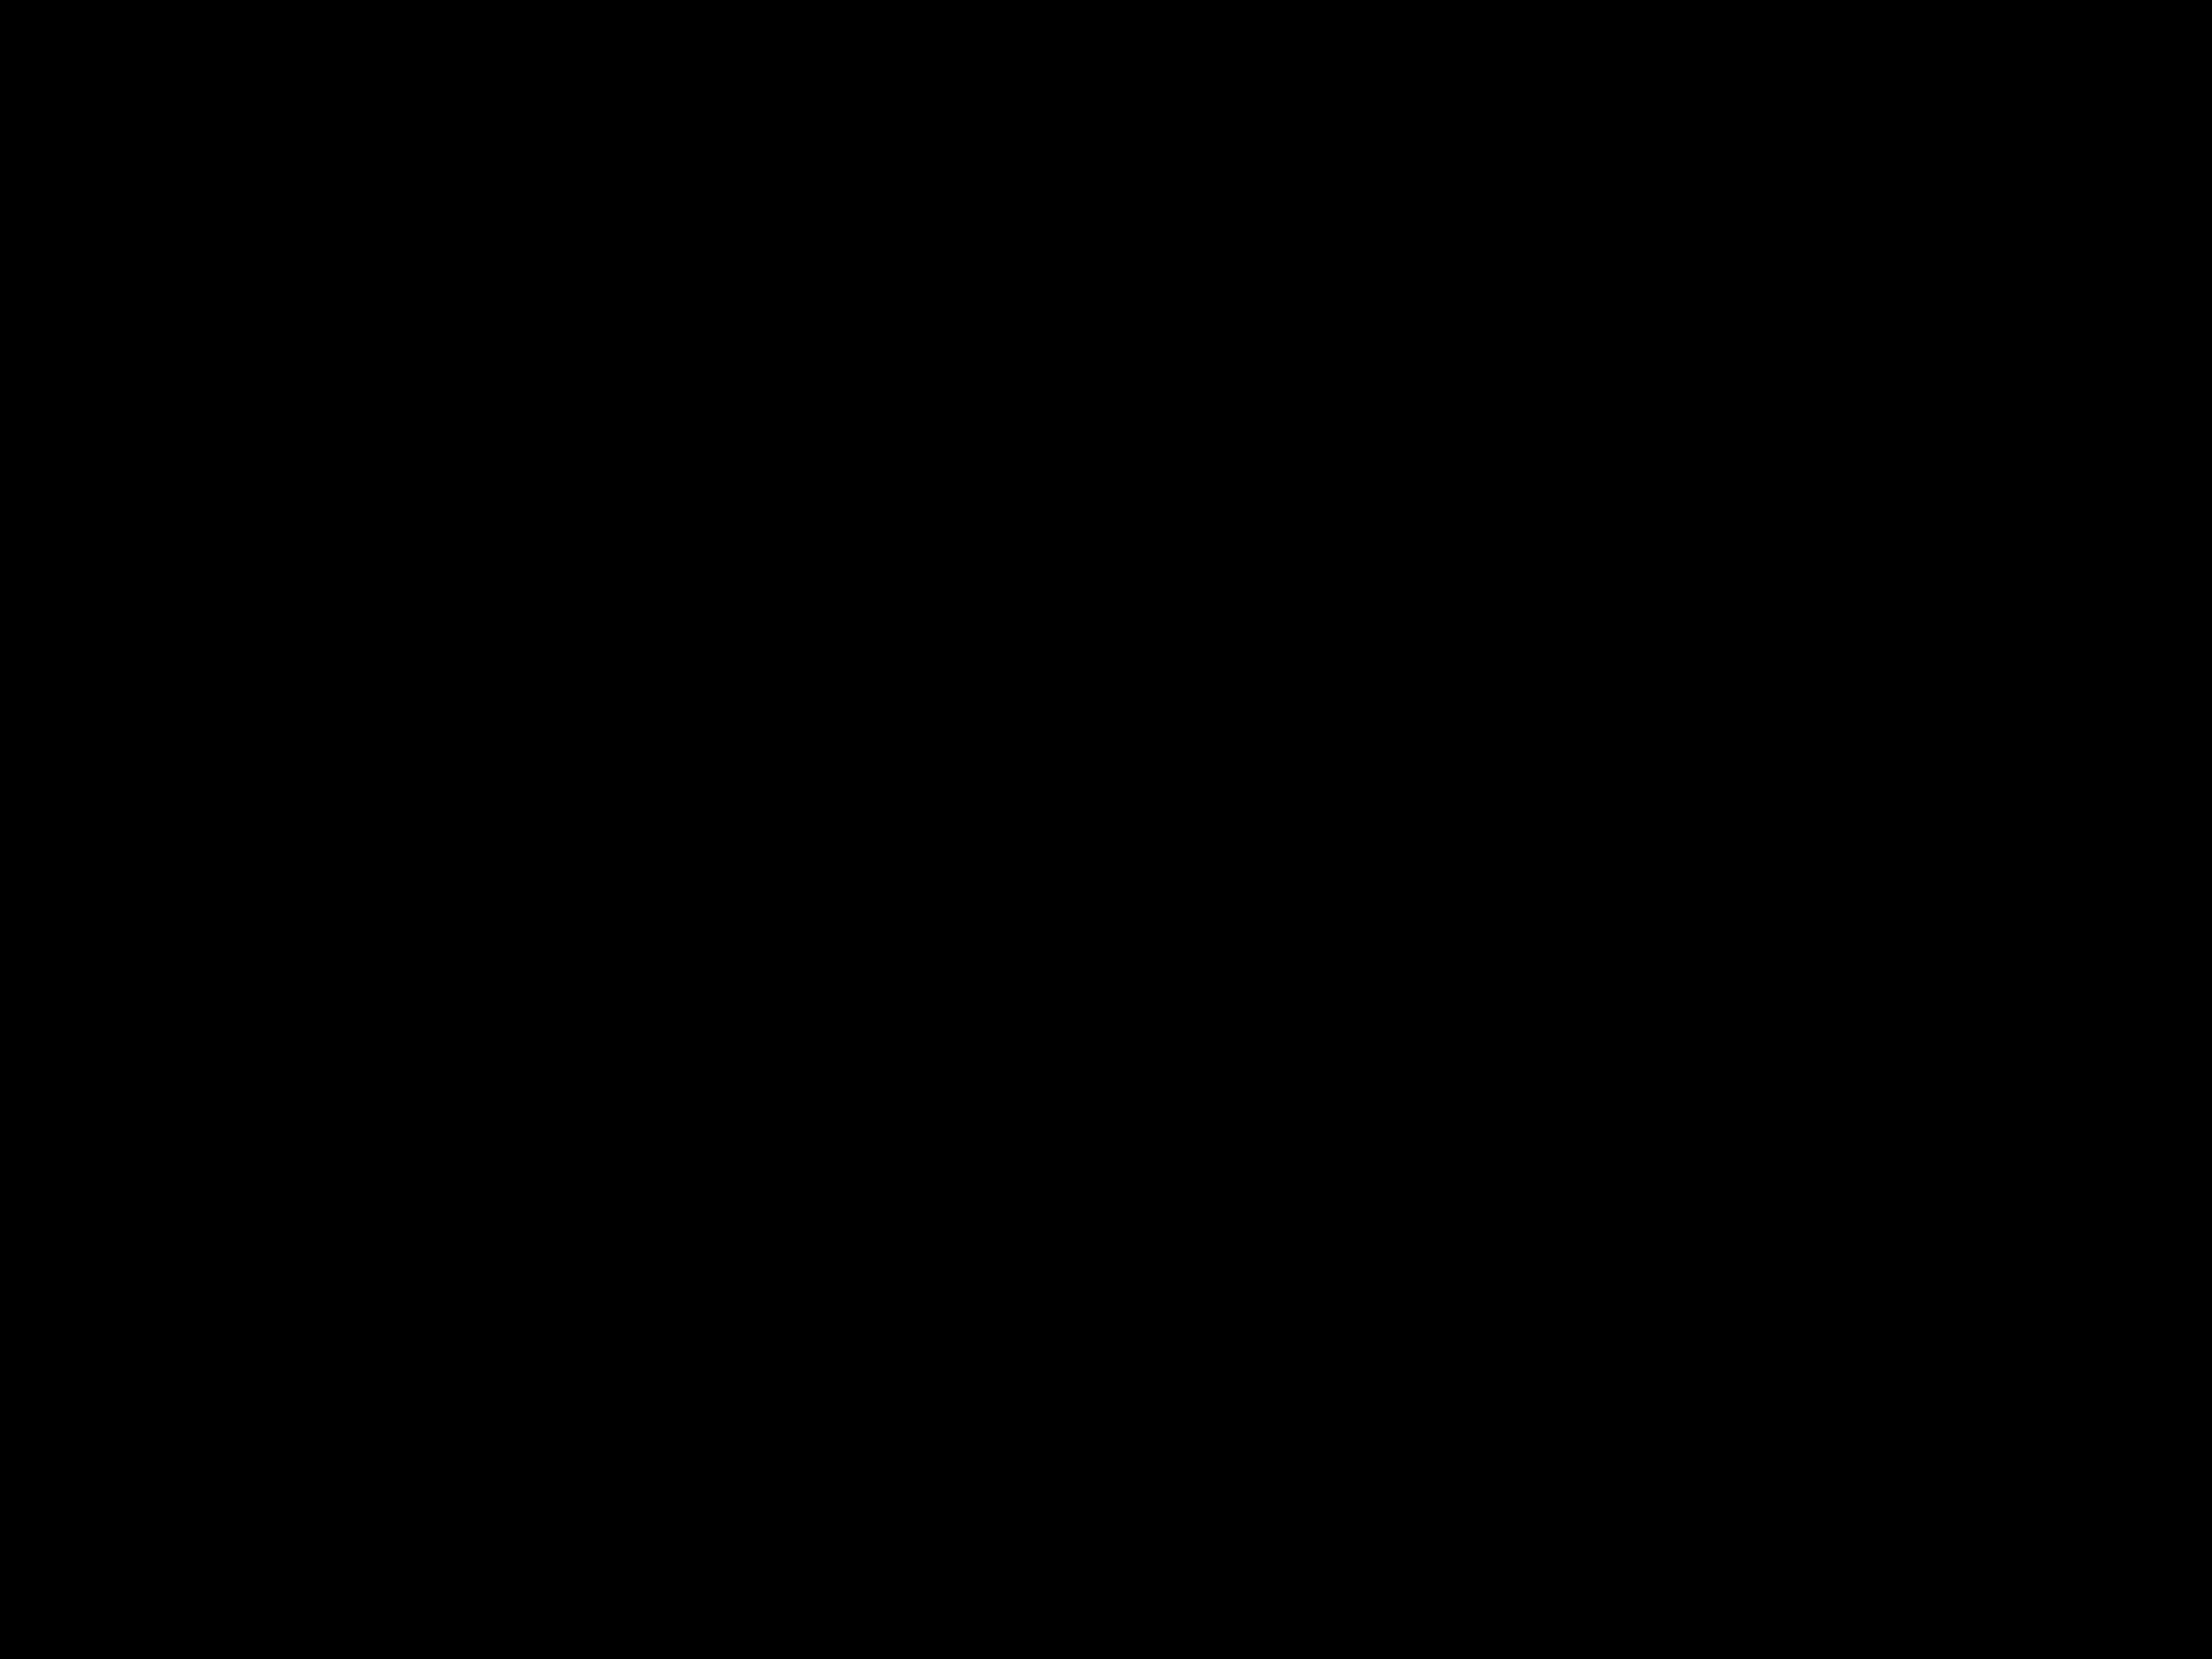 (E)-2-Oxo-3-(2-phenylhydrazono)butanoic Acid